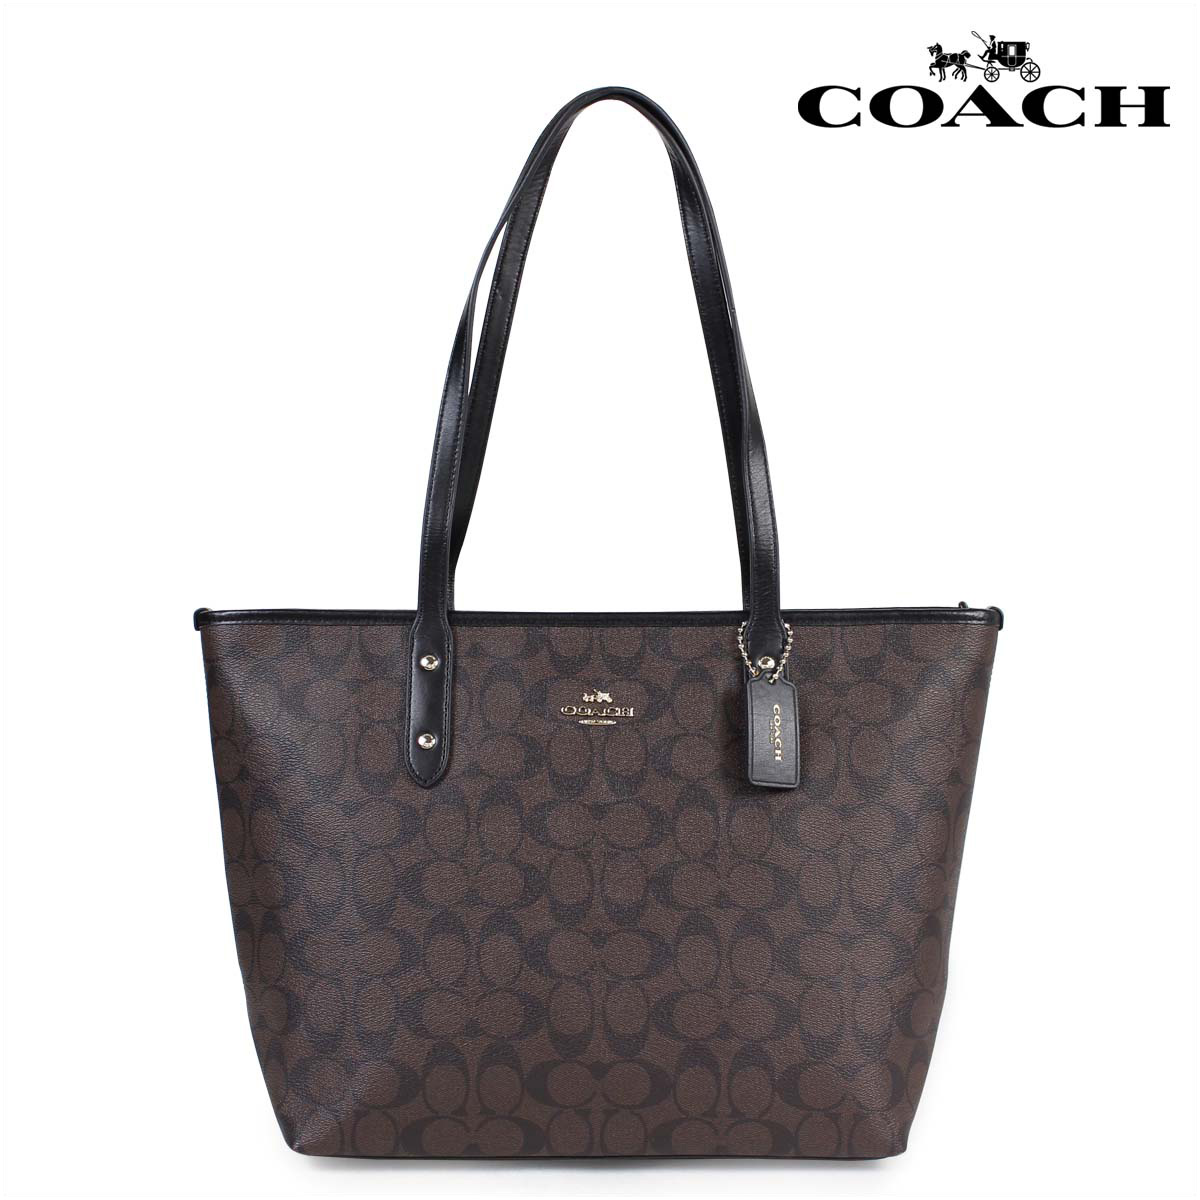 c5e22593e COACH coach bag tote bag Lady's CITY ZIP TOTE IN SIGNATURE F58292 brown ...